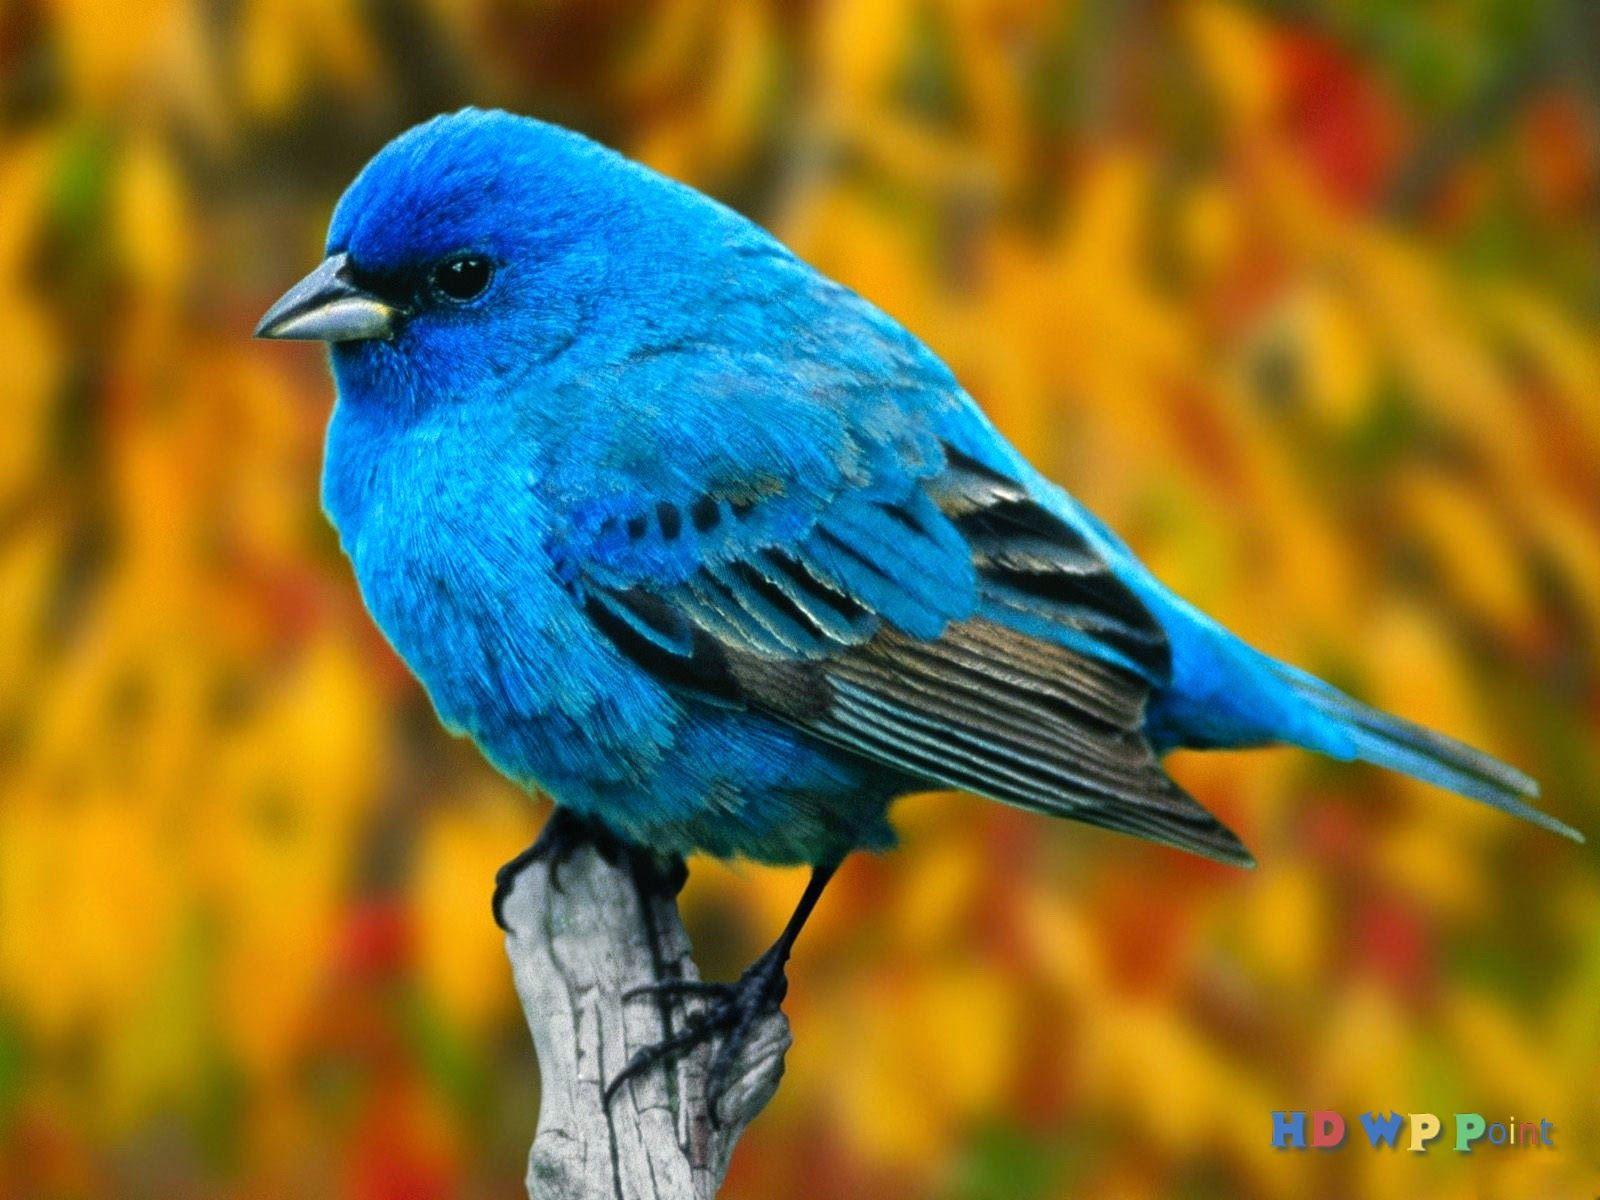 Beautiful Blue Bird Hd Wallpapers Point Beautiful Bird Wallpaper Pet Birds Bird Pictures